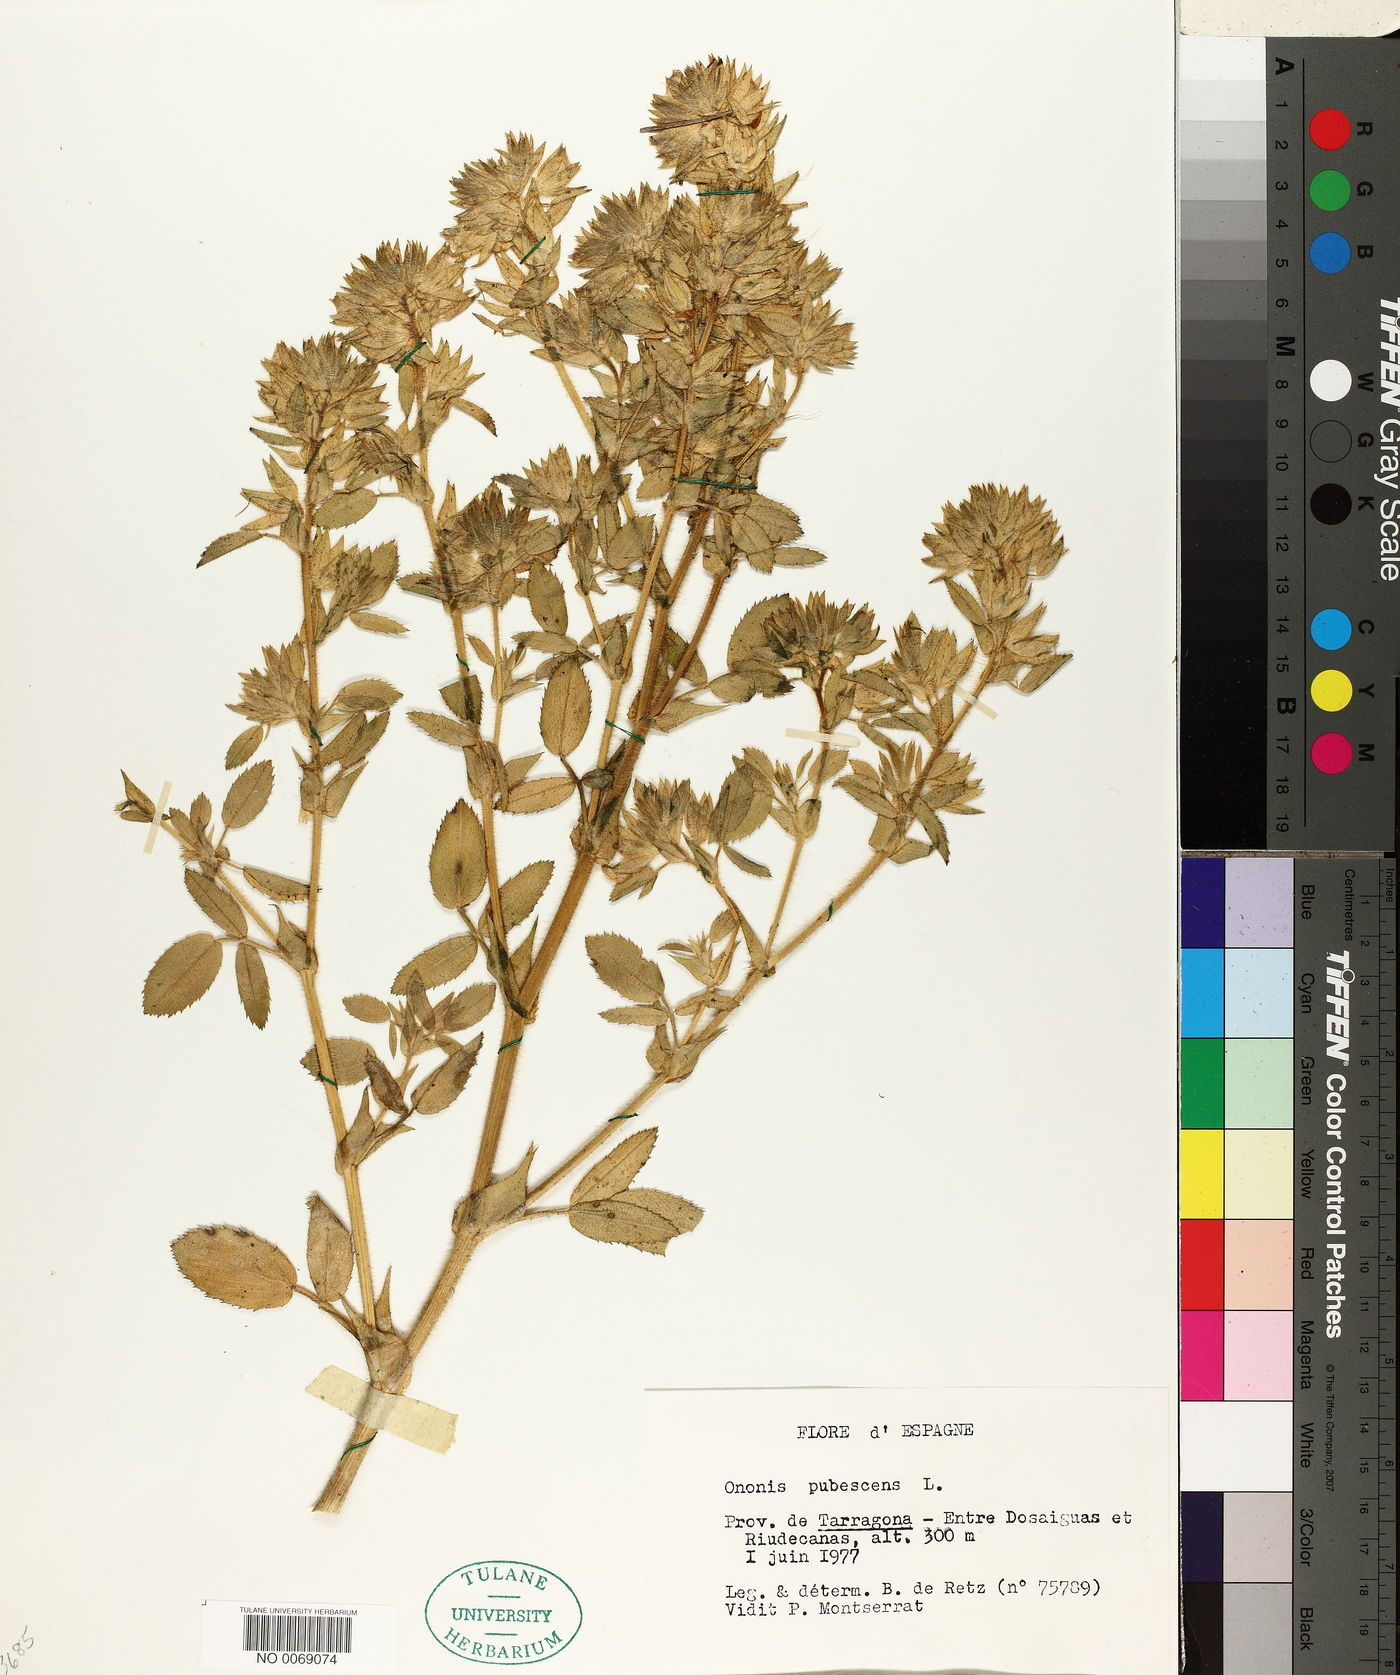 Ononis pubescens image